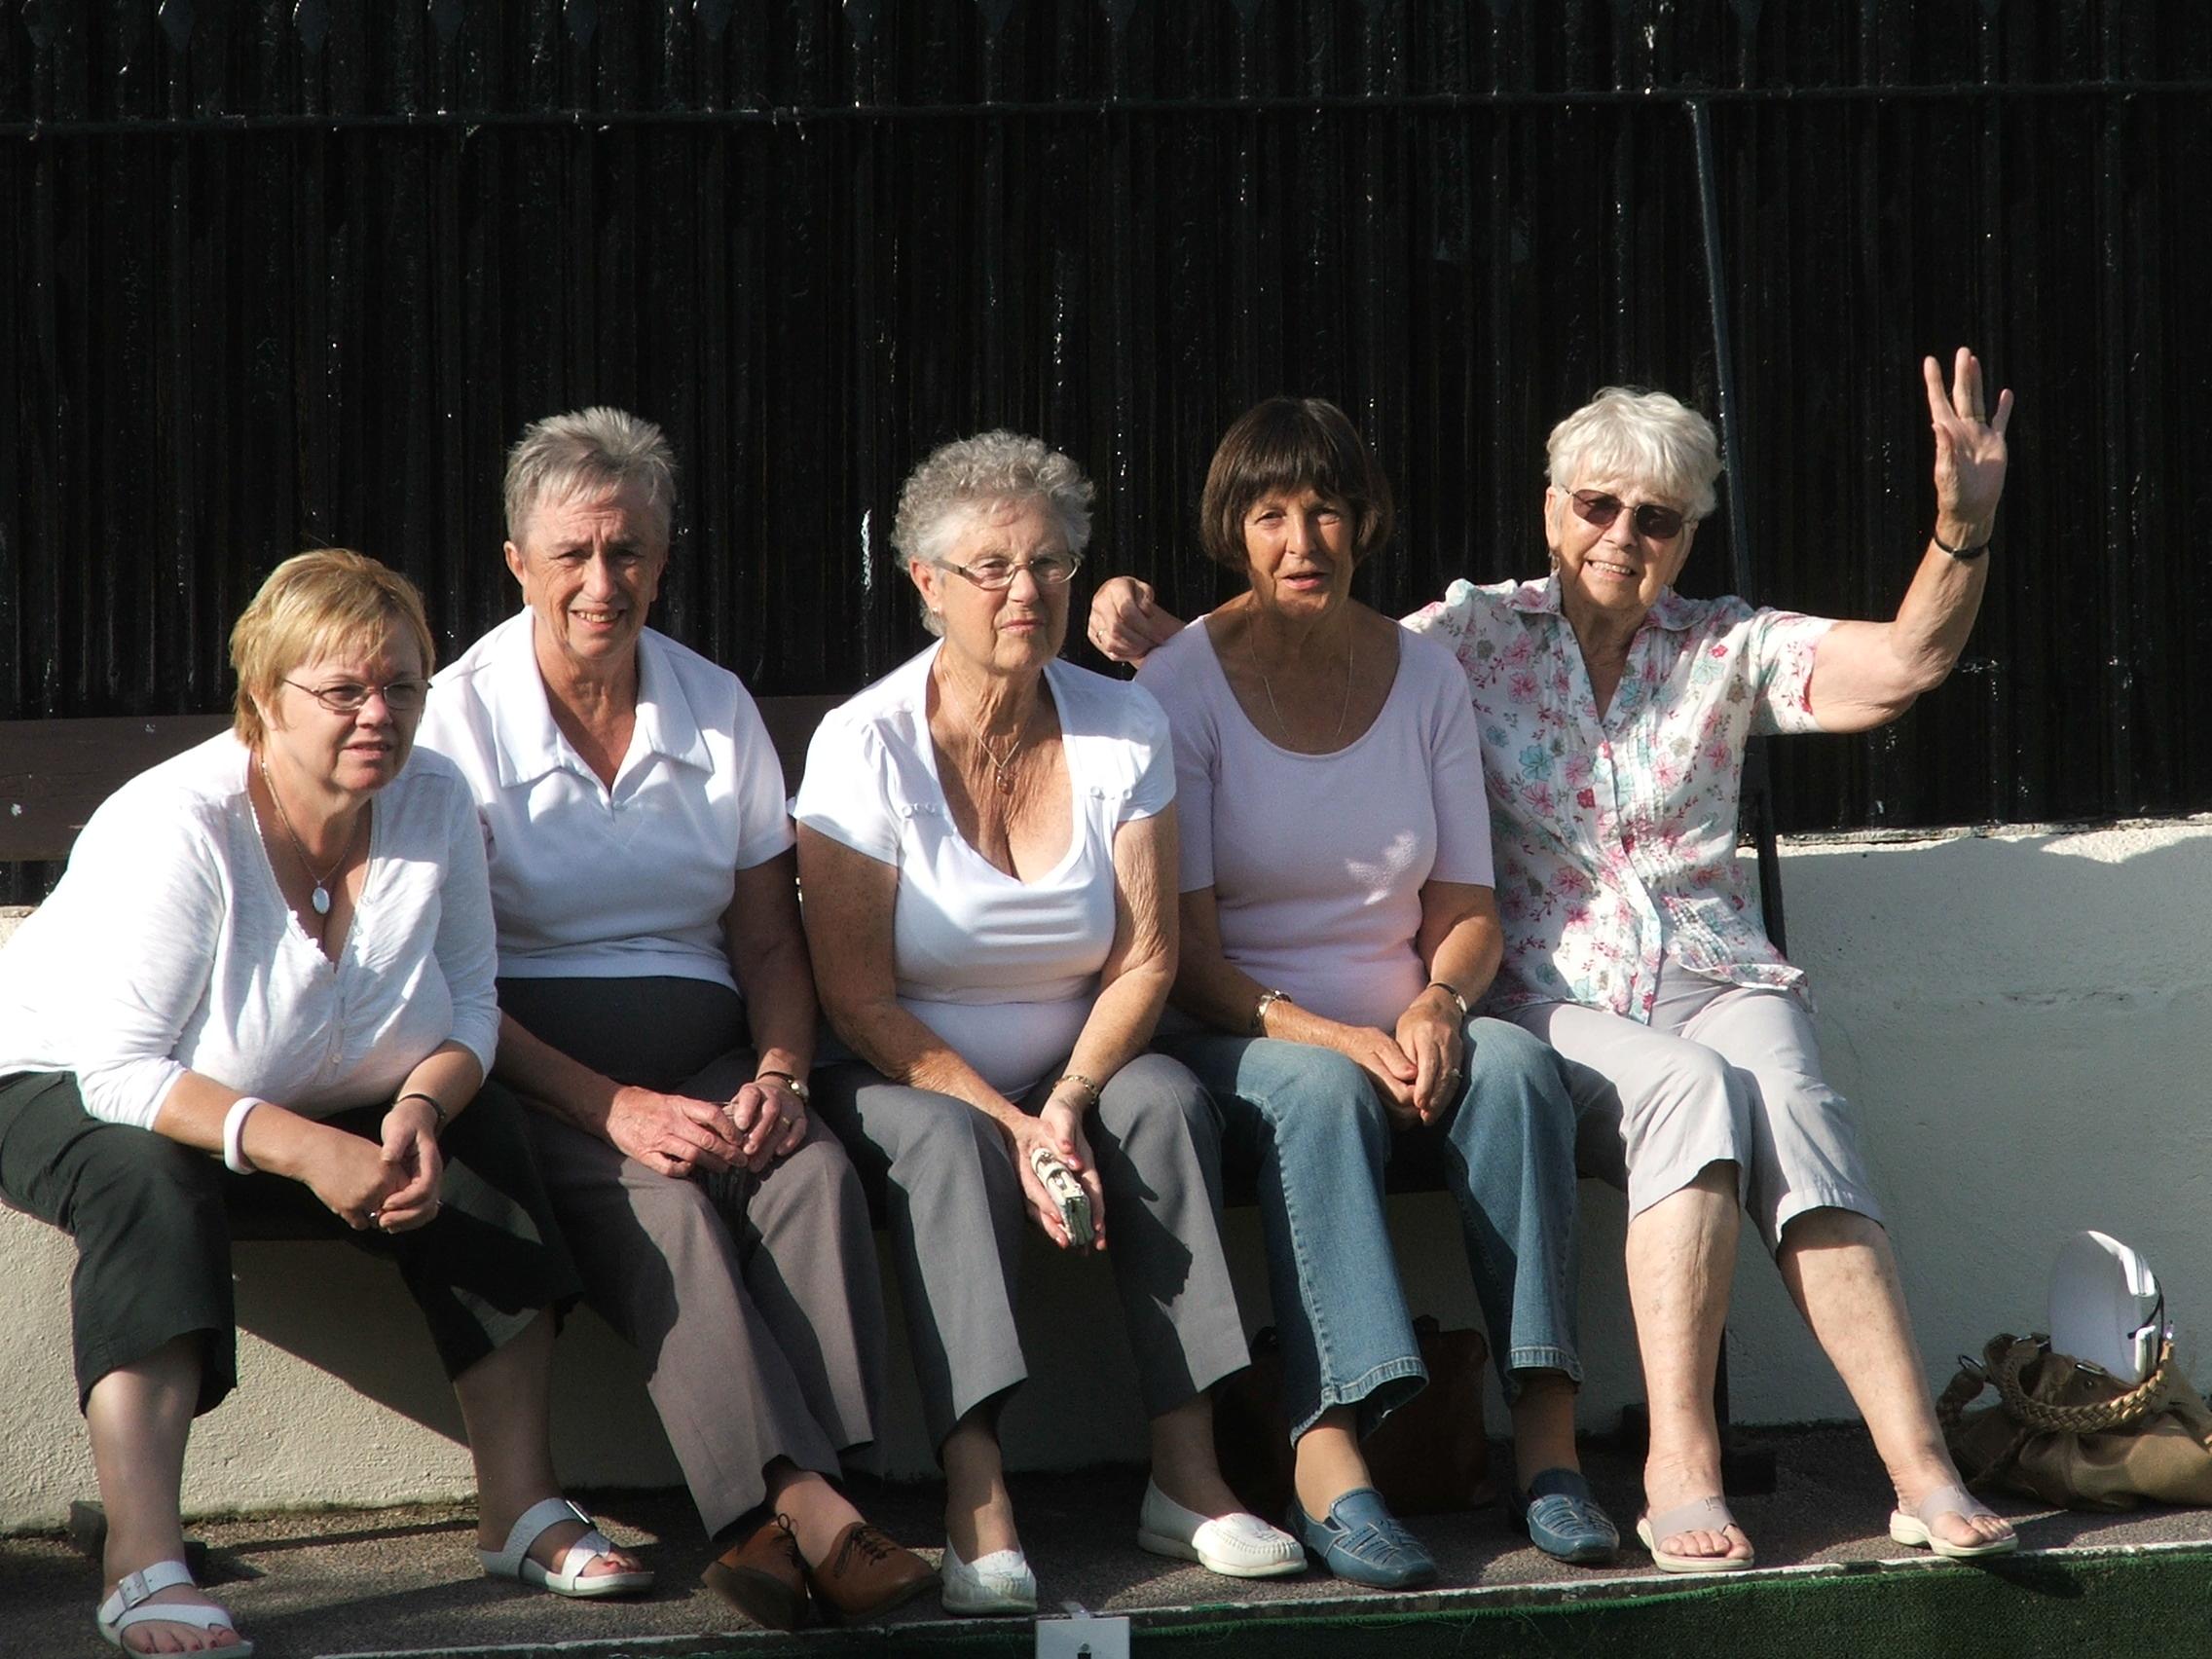 torquay bowls tour 2009 022.JPG